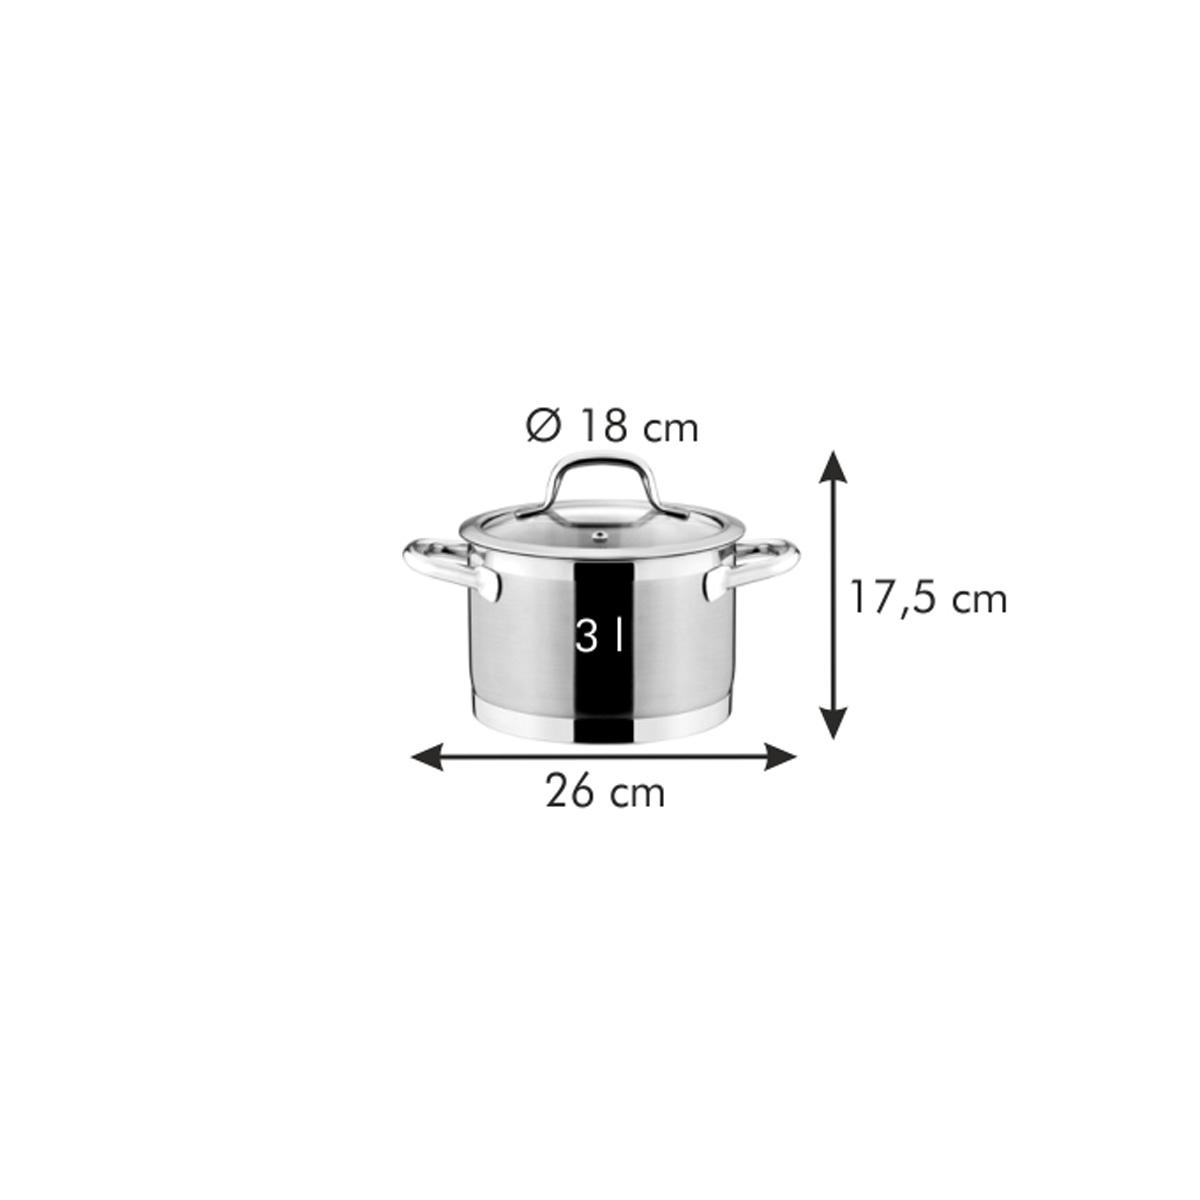 Hrnec PRESIDENT s poklicí ø 18 cm, 3.0 l